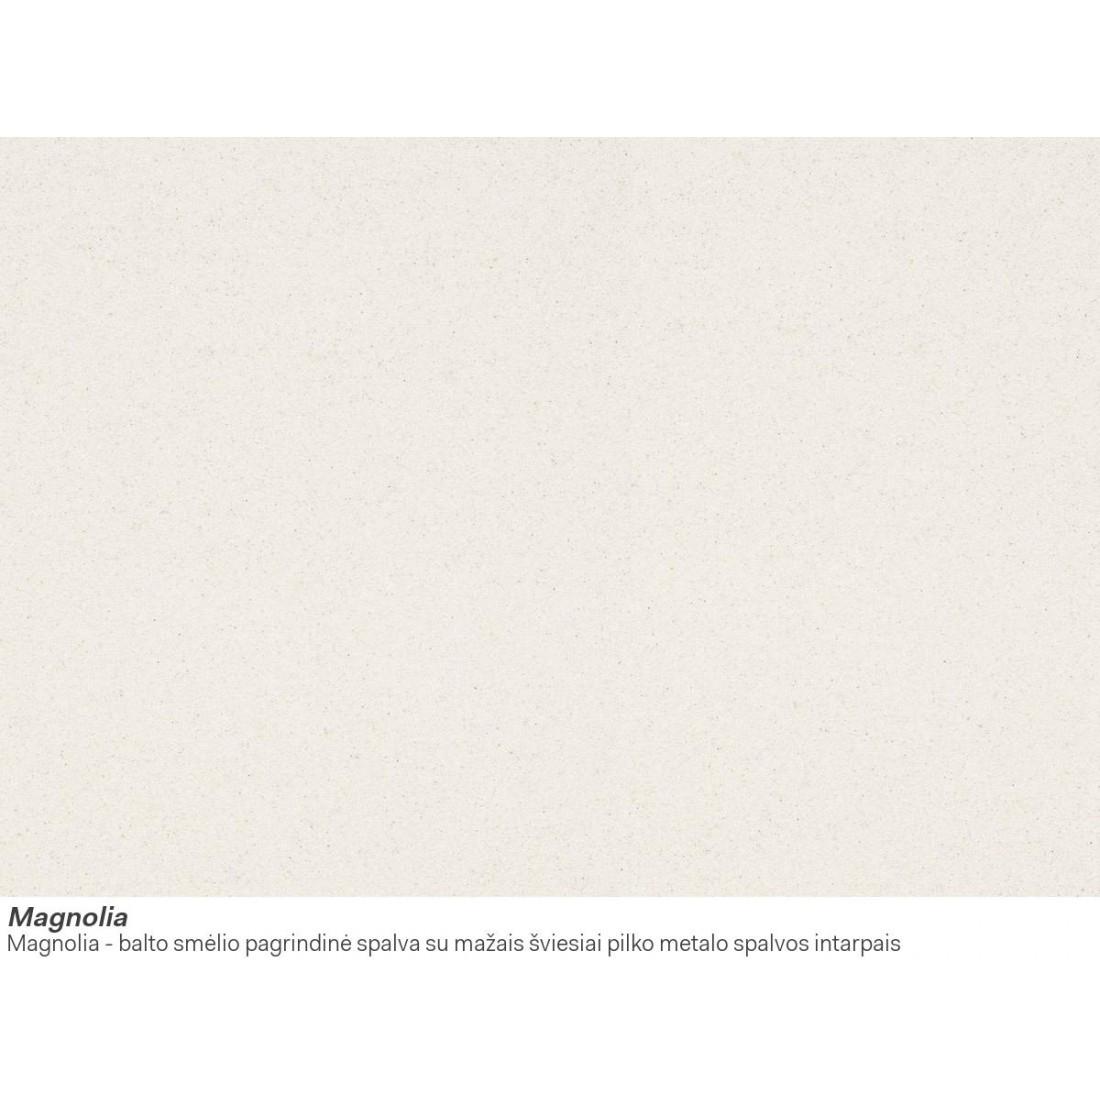 Akmens masės plautuvė Franke Ronda ROG 611-62, ekscentrinis ventilis, Magnolia